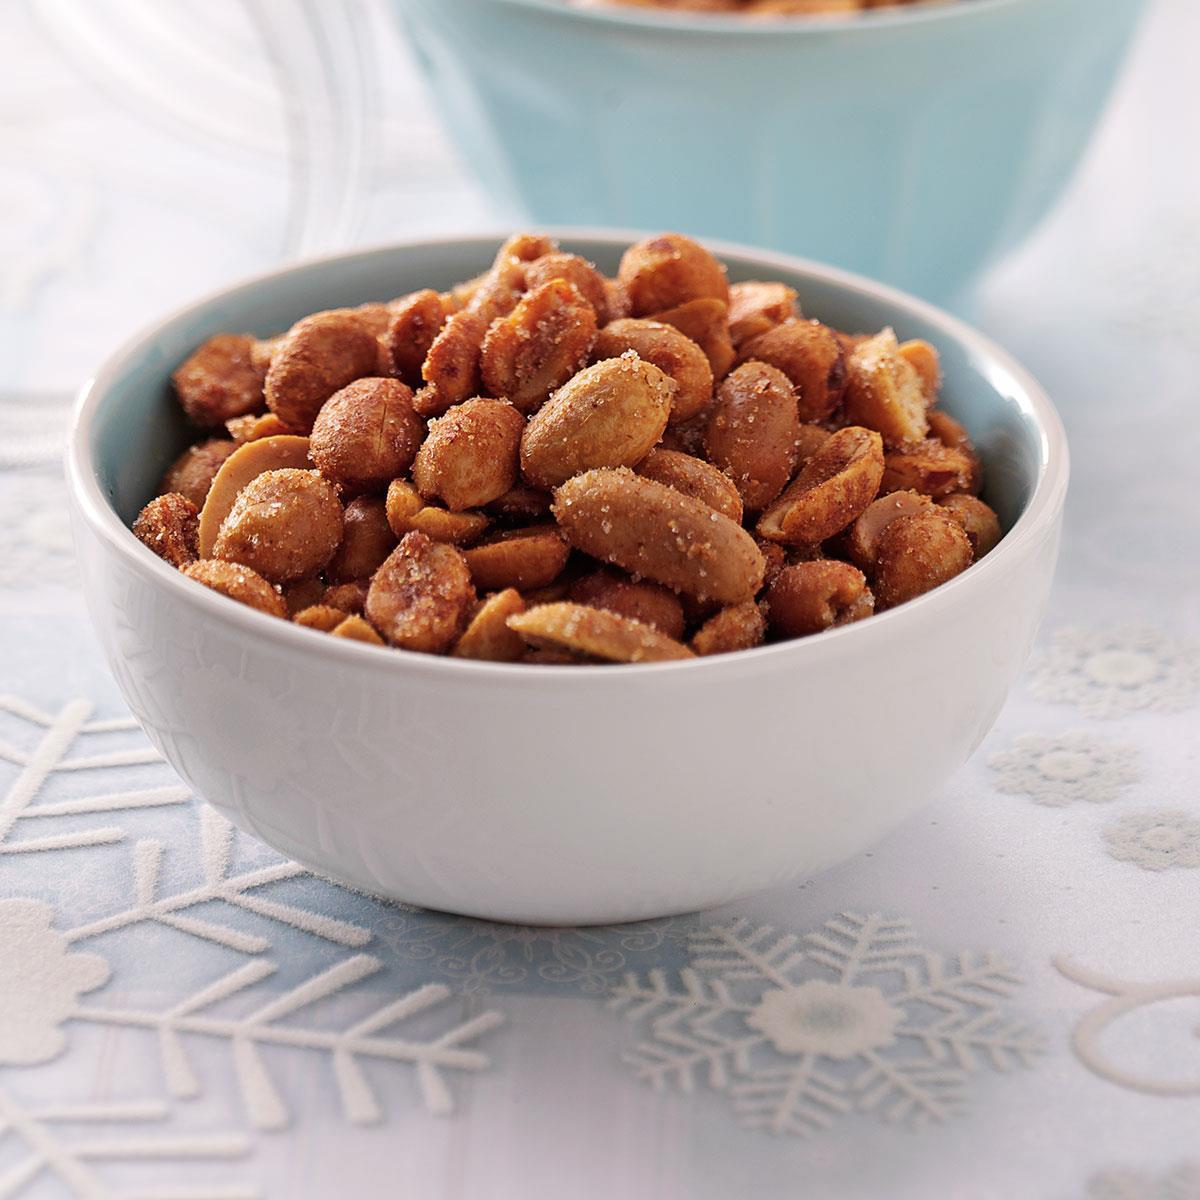 Spiced-peanuts-recipe